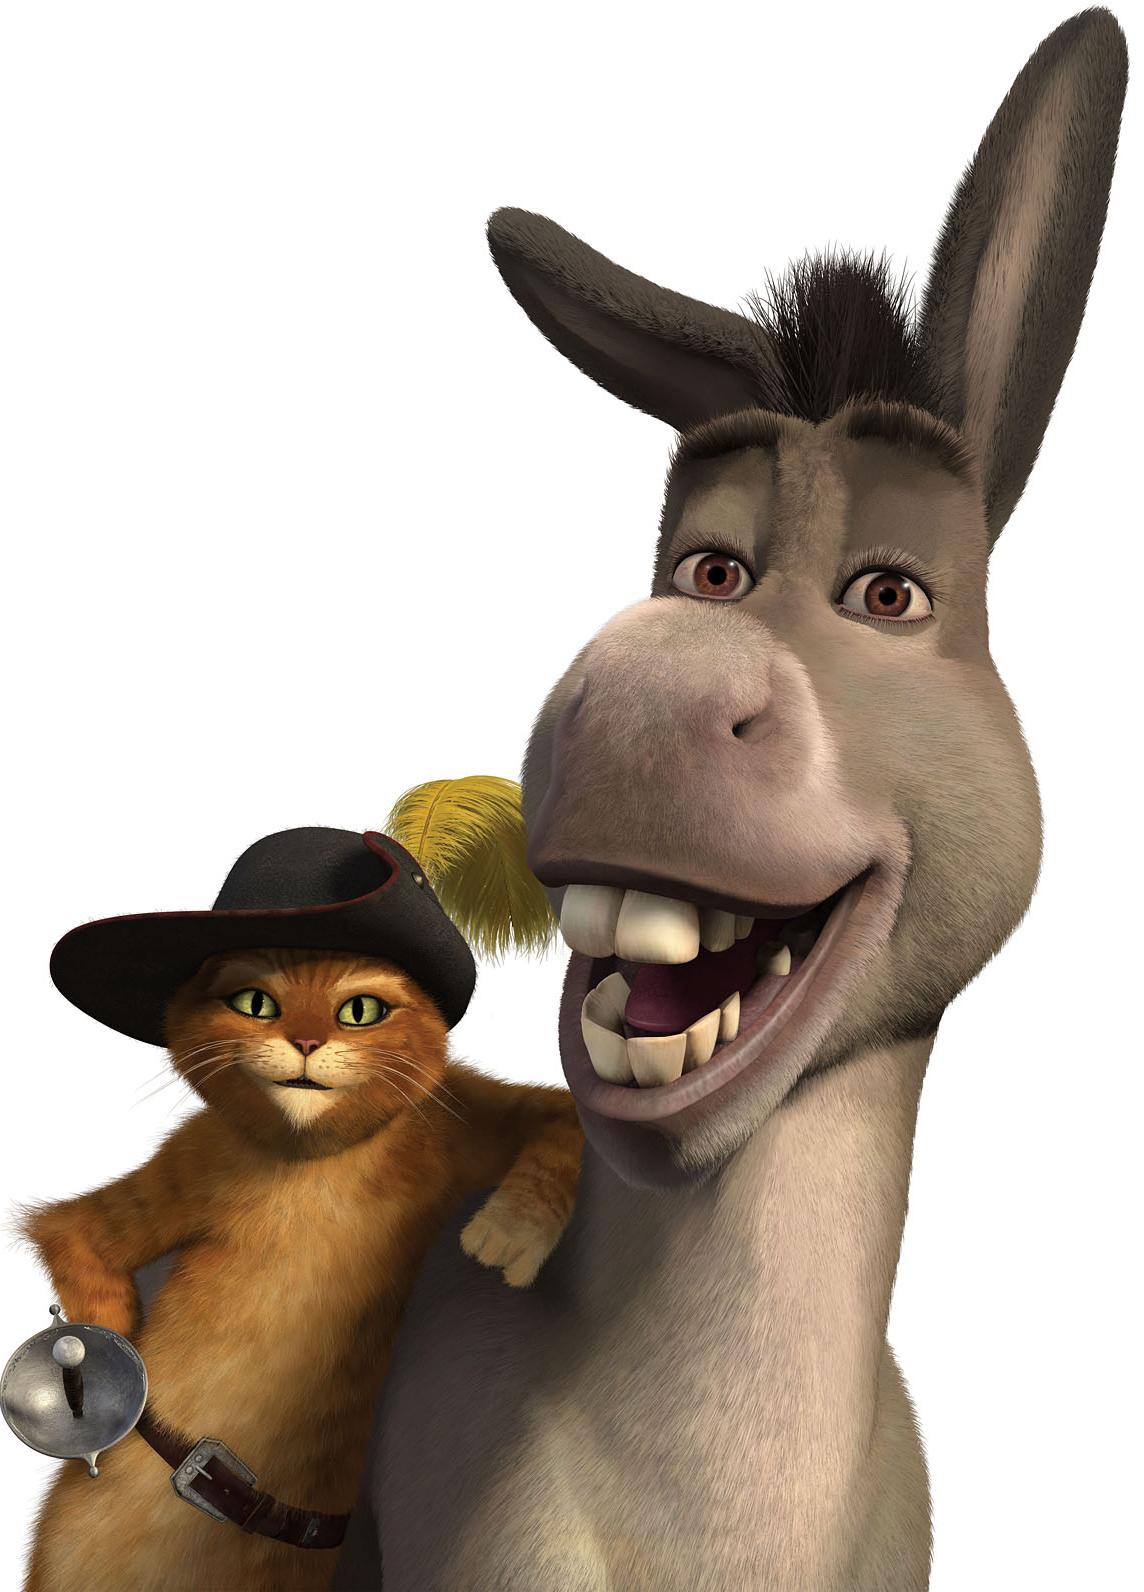 Donkey clipart shrek character. Crazywidow info